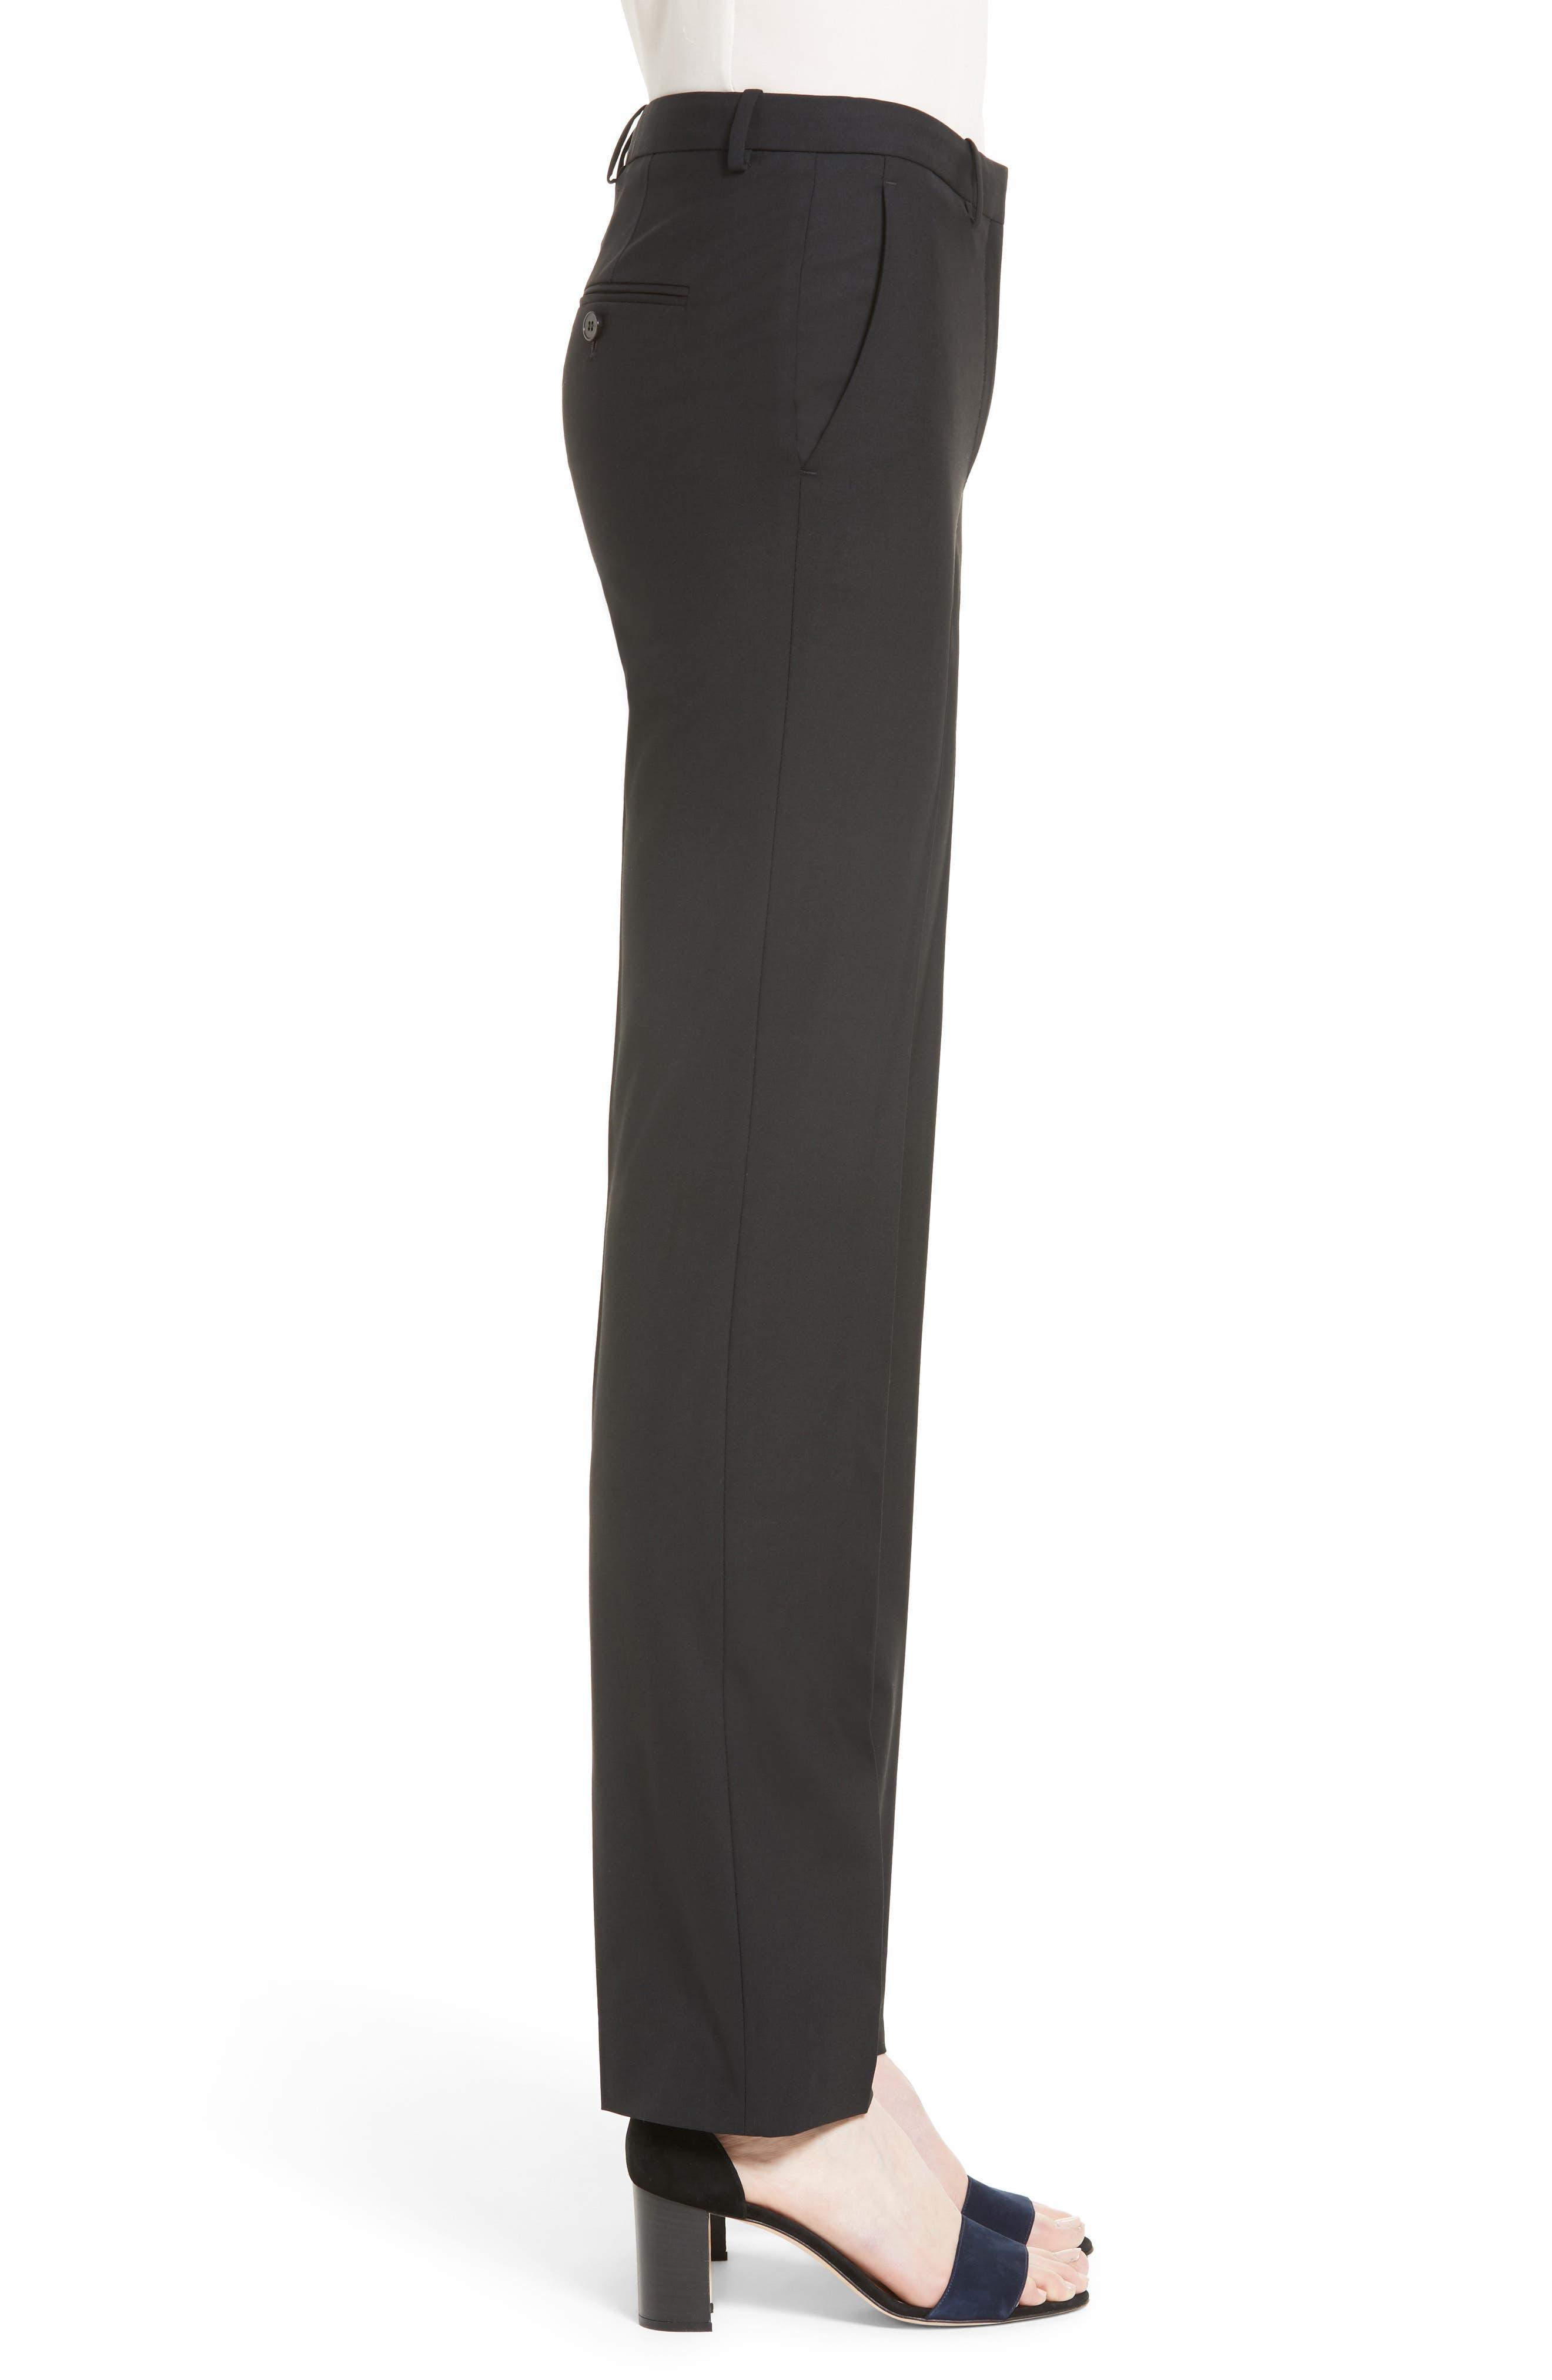 Hartsdale B Good Wool Suit Pants,                             Alternate thumbnail 3, color,                             BLACK